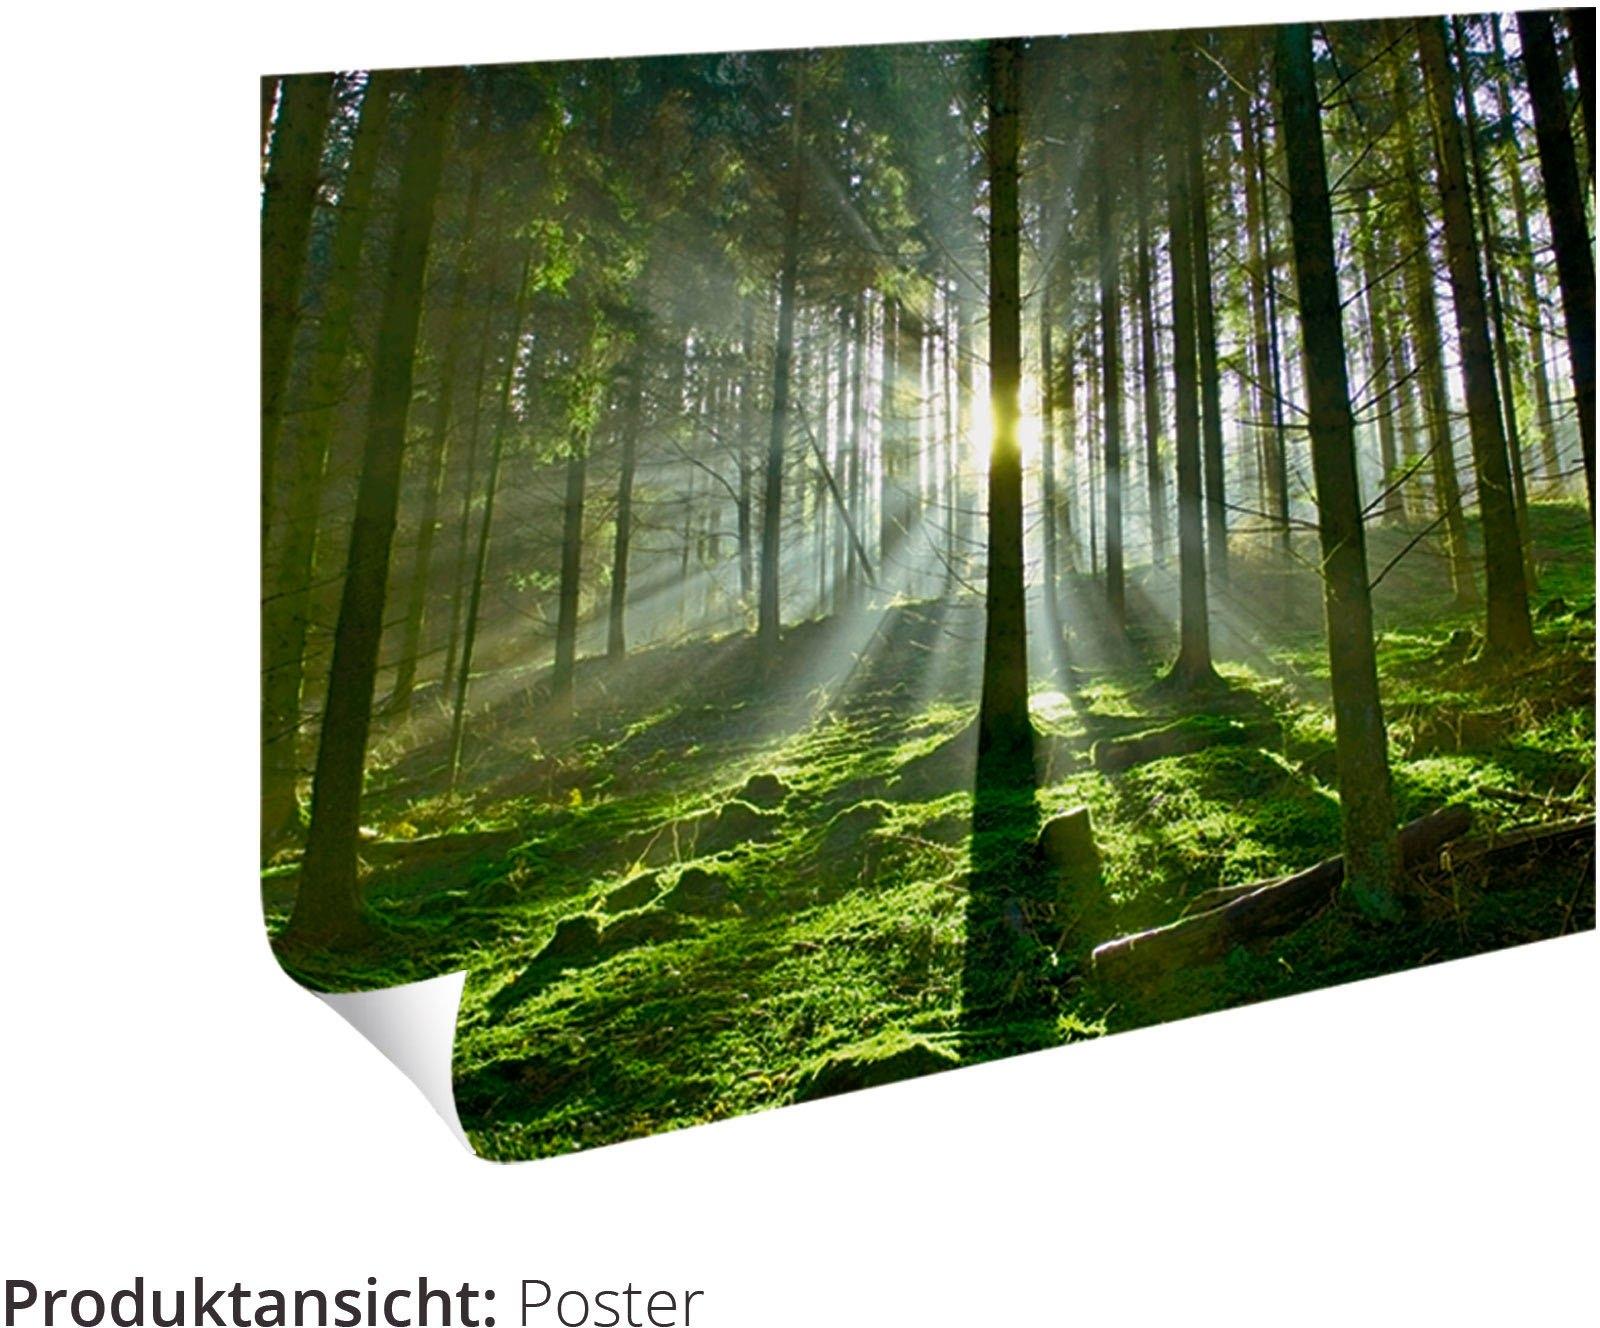 Artland artprint »Trünnensee Mecklenburger Seenplatte« bestellen: 30 dagen bedenktijd